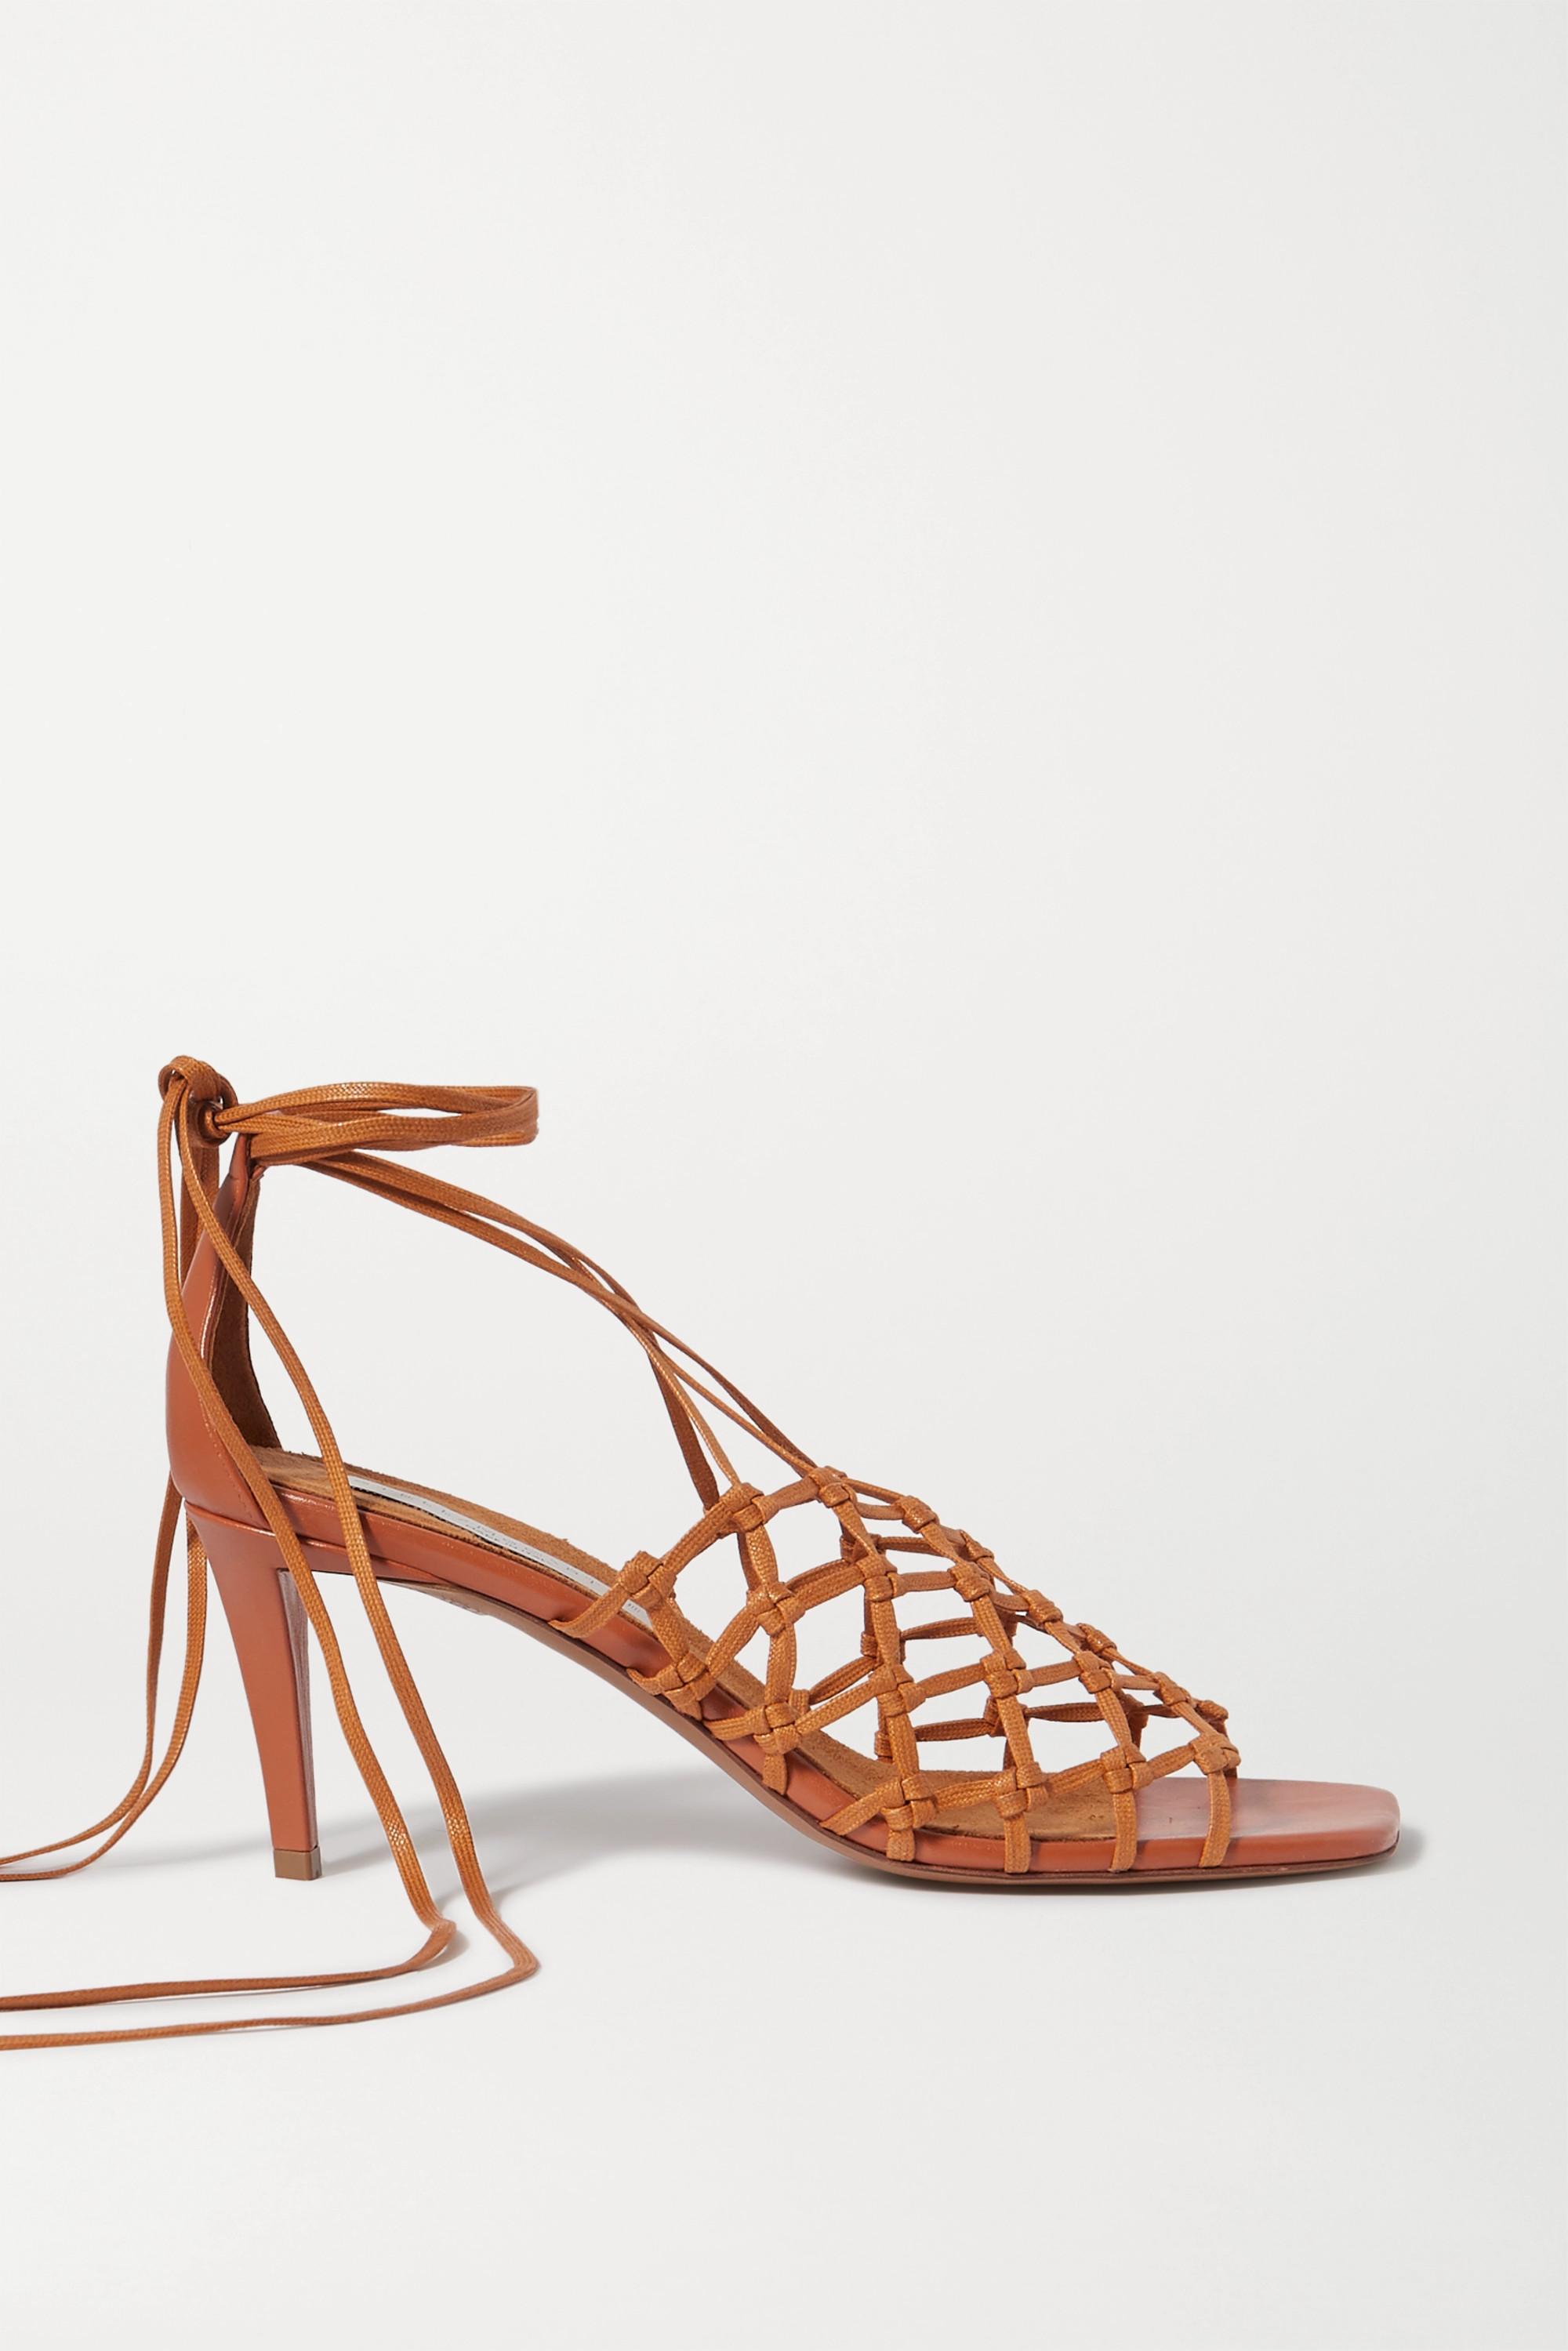 Stella McCartney Vegetarian leather sandals